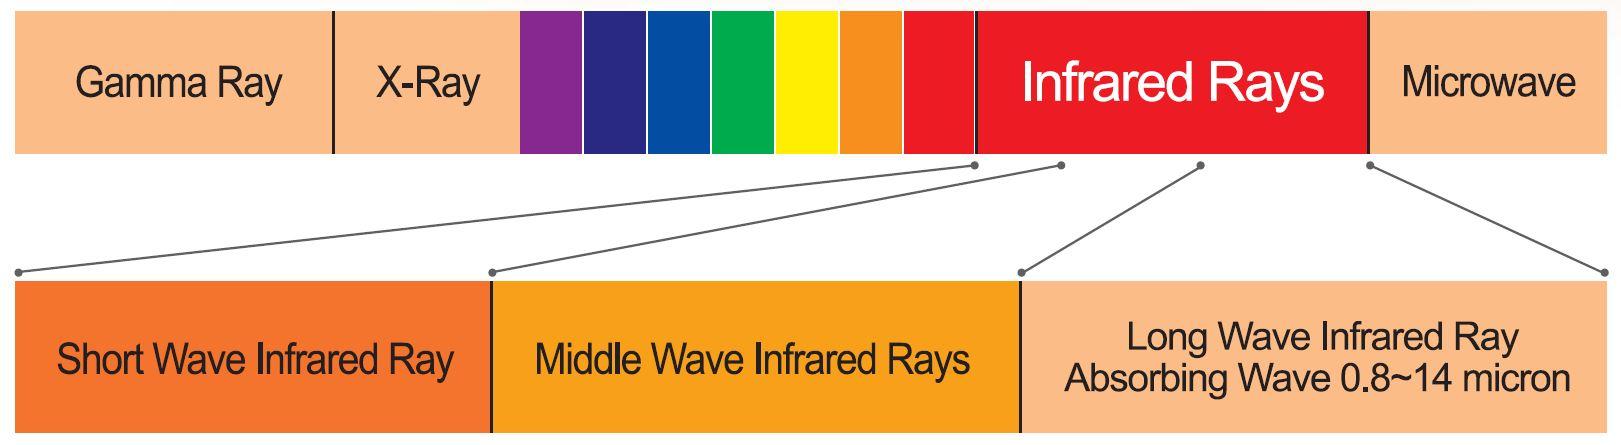 Infrared Rays spectrum